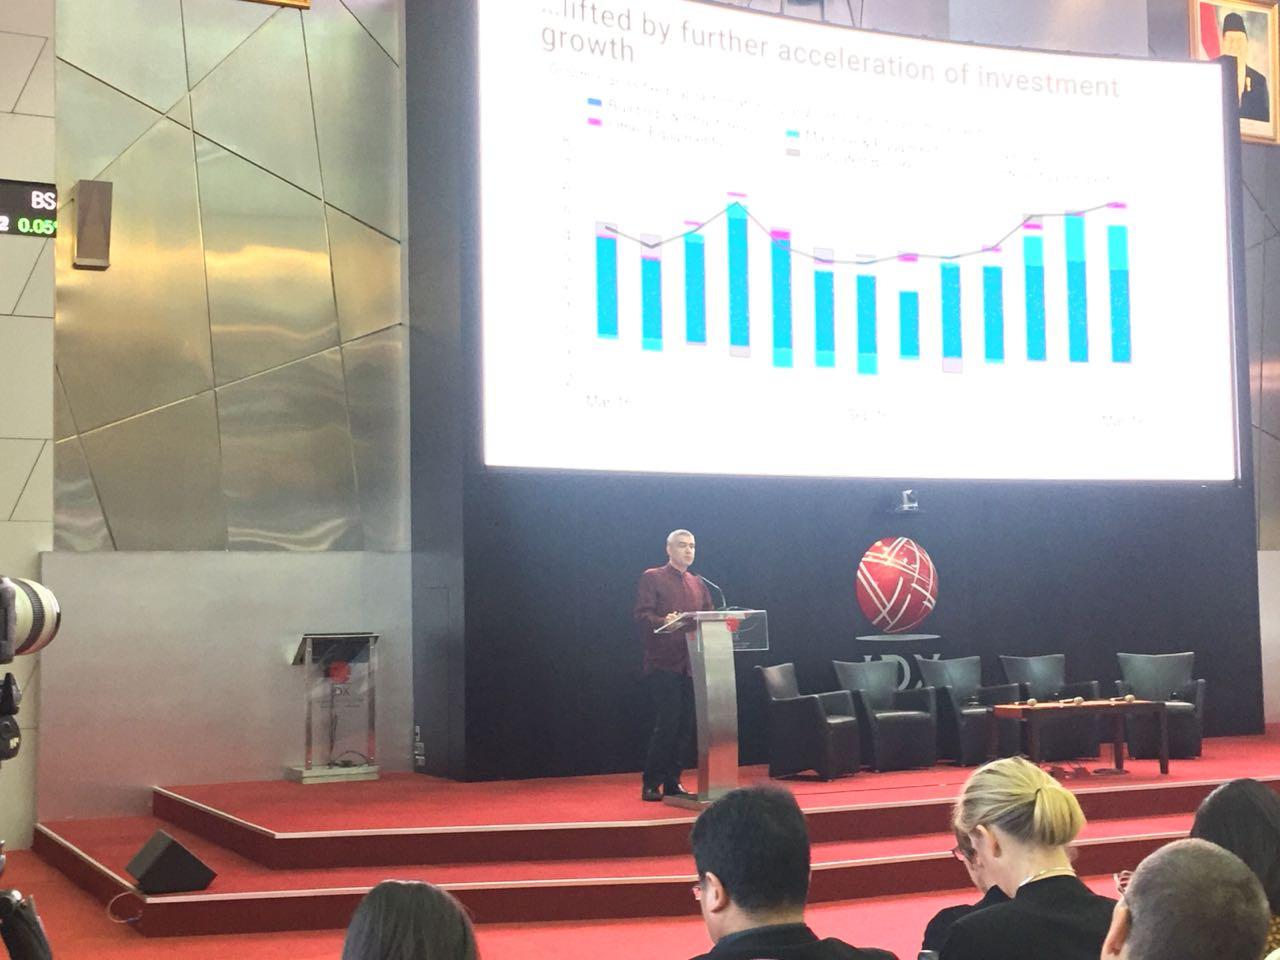 https: img.okeinfo.net content 2018 06 06 20 1907257 bank-dunia-sebut-ekonomi-indonesia-tumbuh-cepat-di-triwulan-pertama-5HBJuqZsJw.jpeg